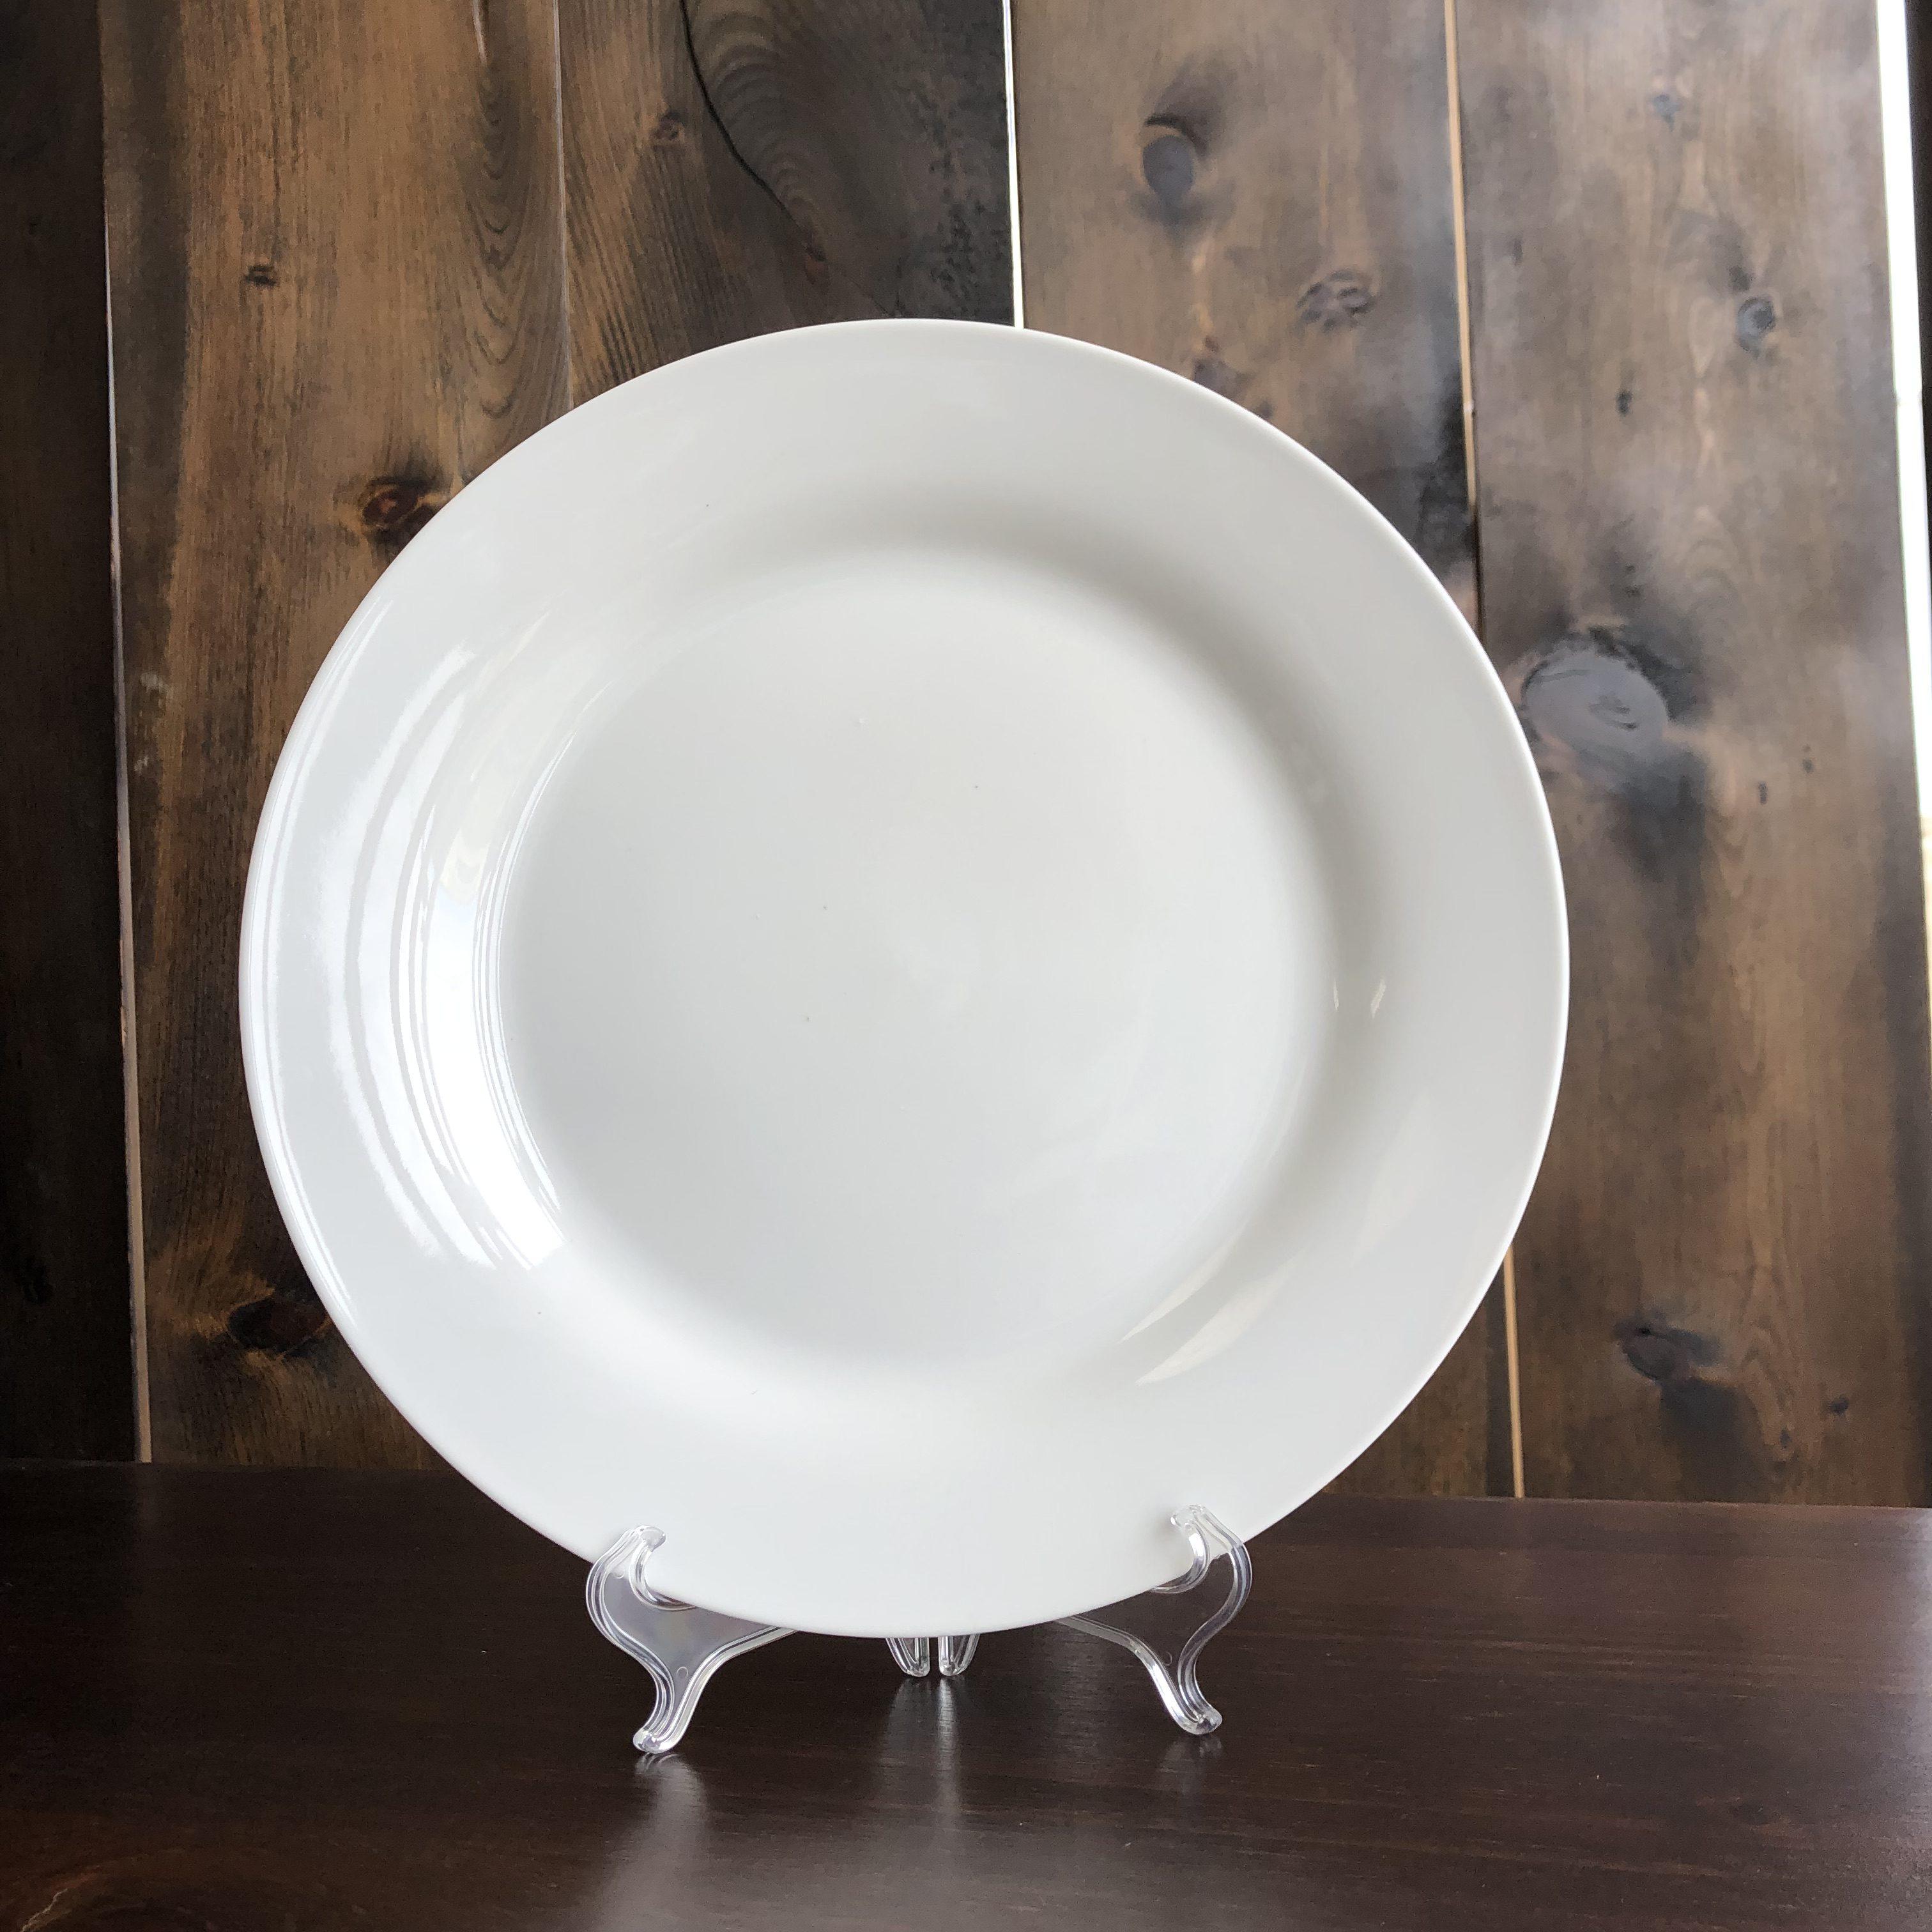 Porcelain Dinner Plates 12 Image